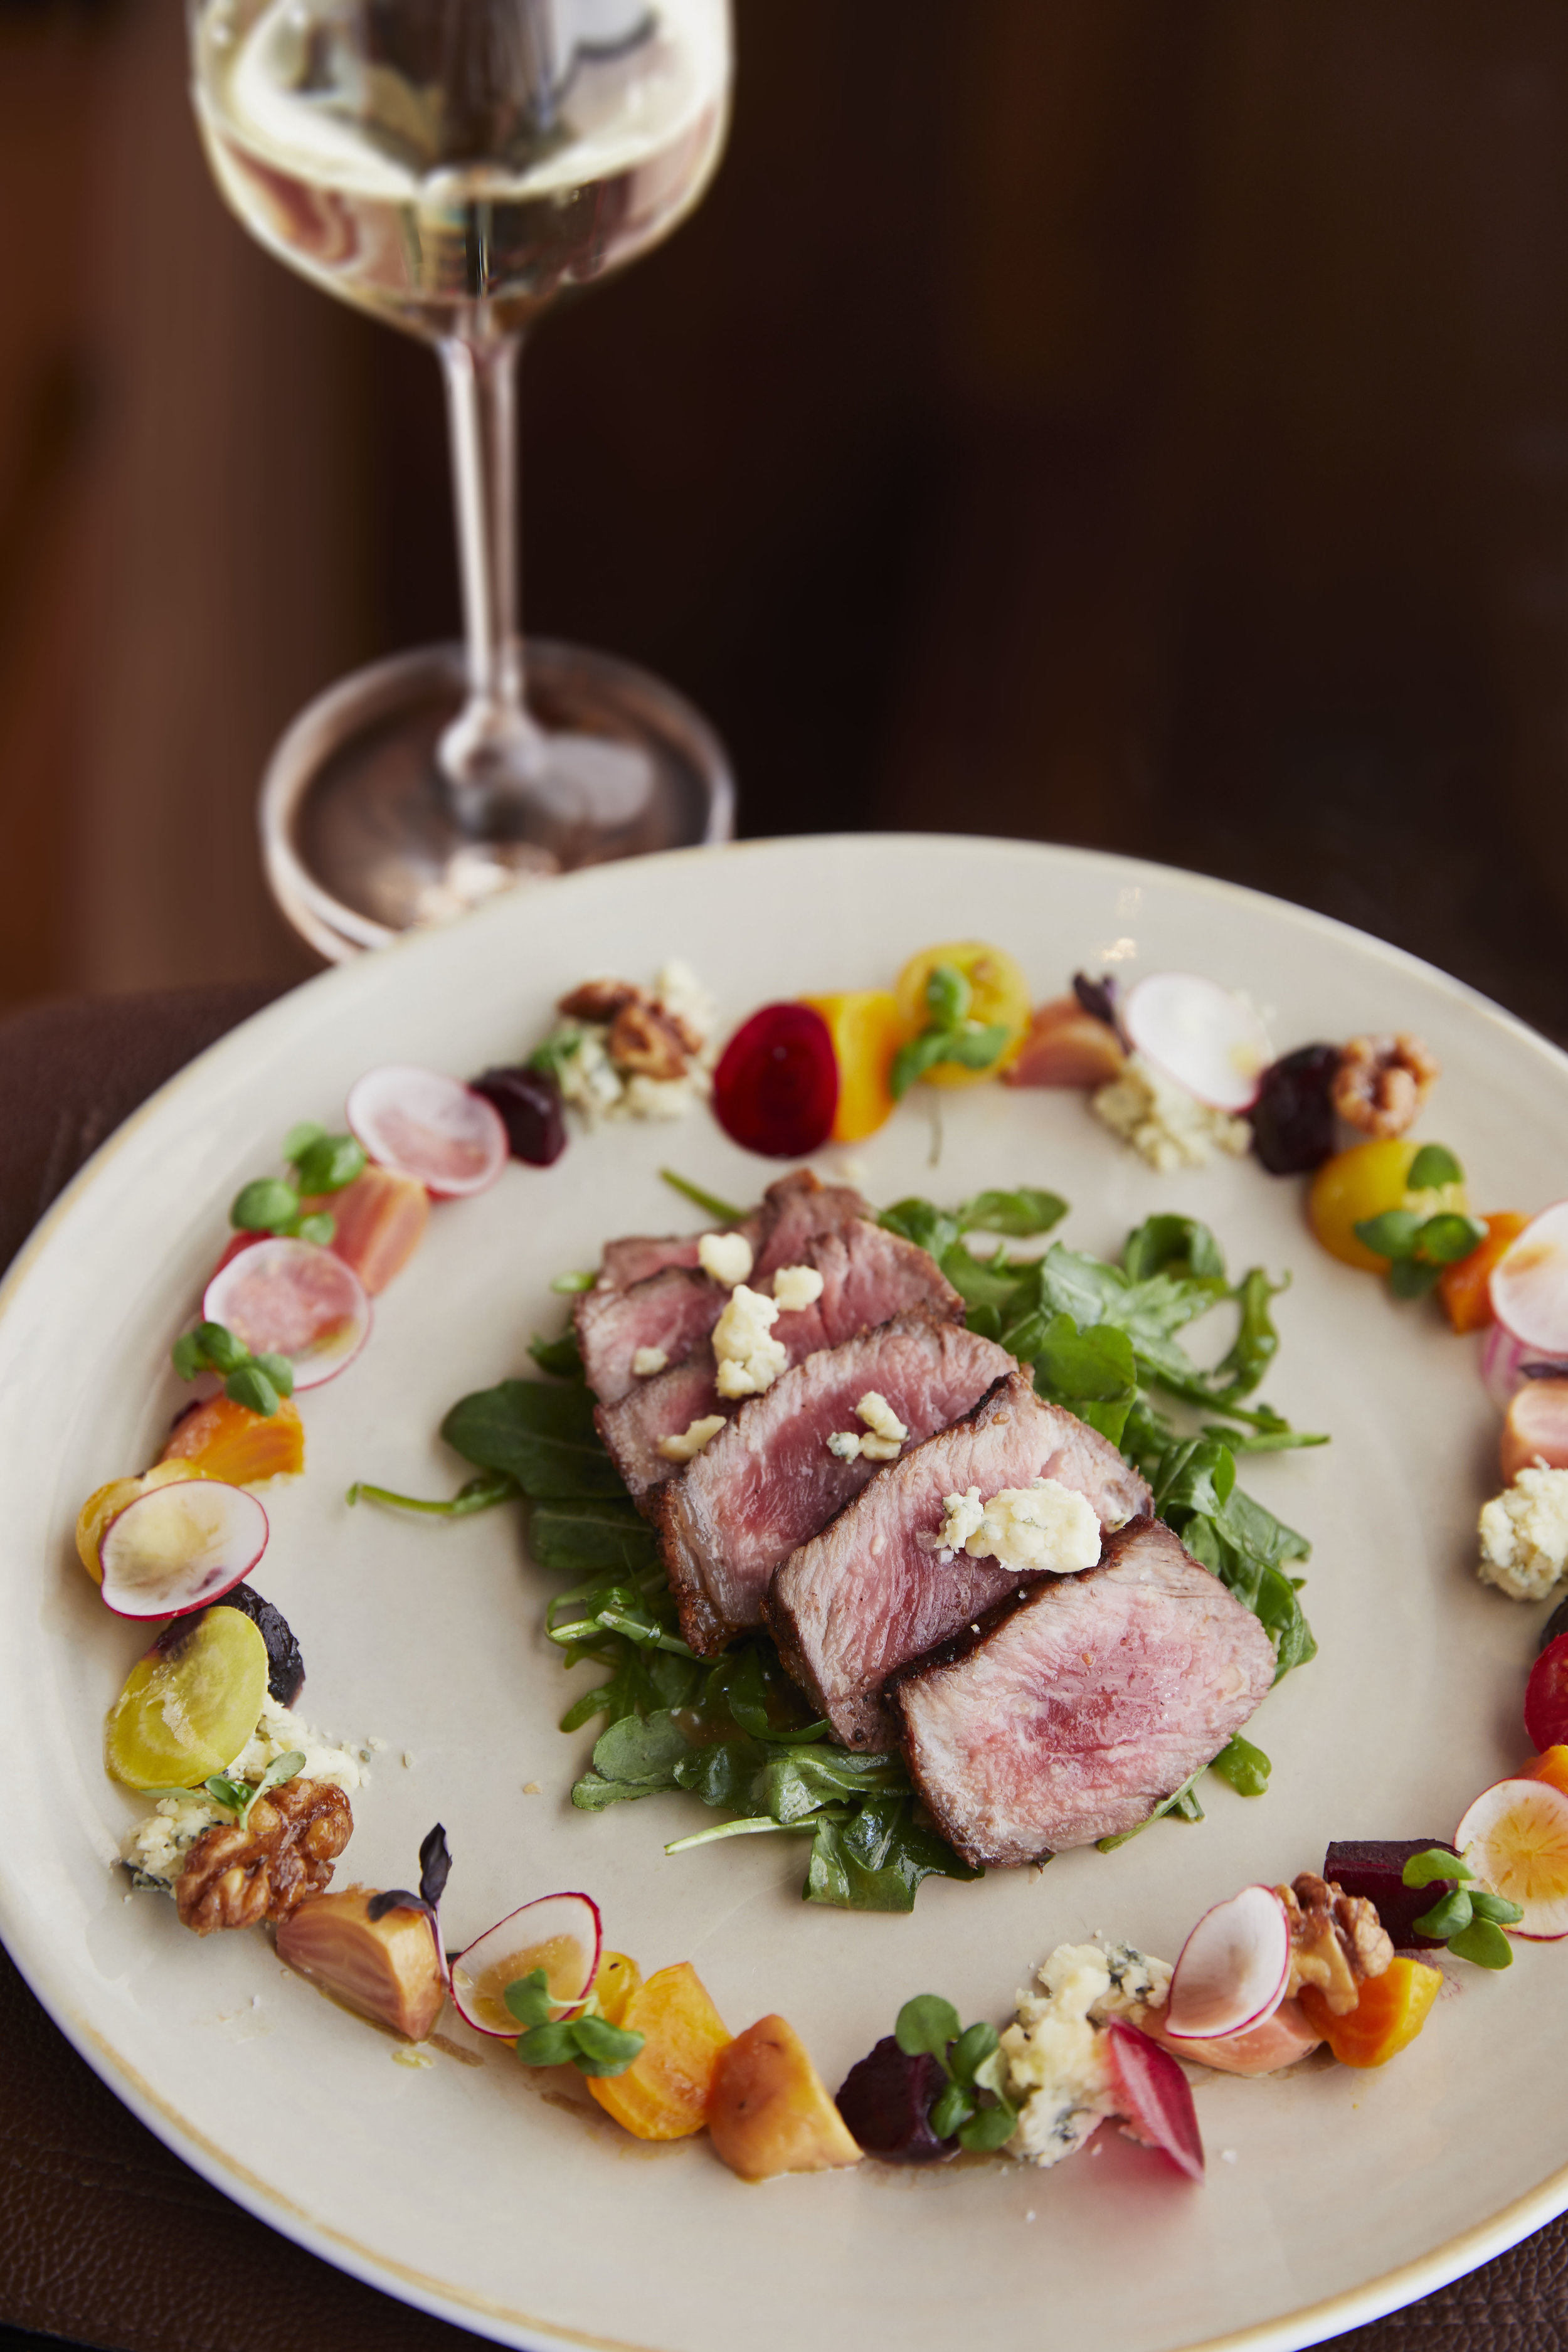 20190329-steak-salad-305-hrj copy.jpg